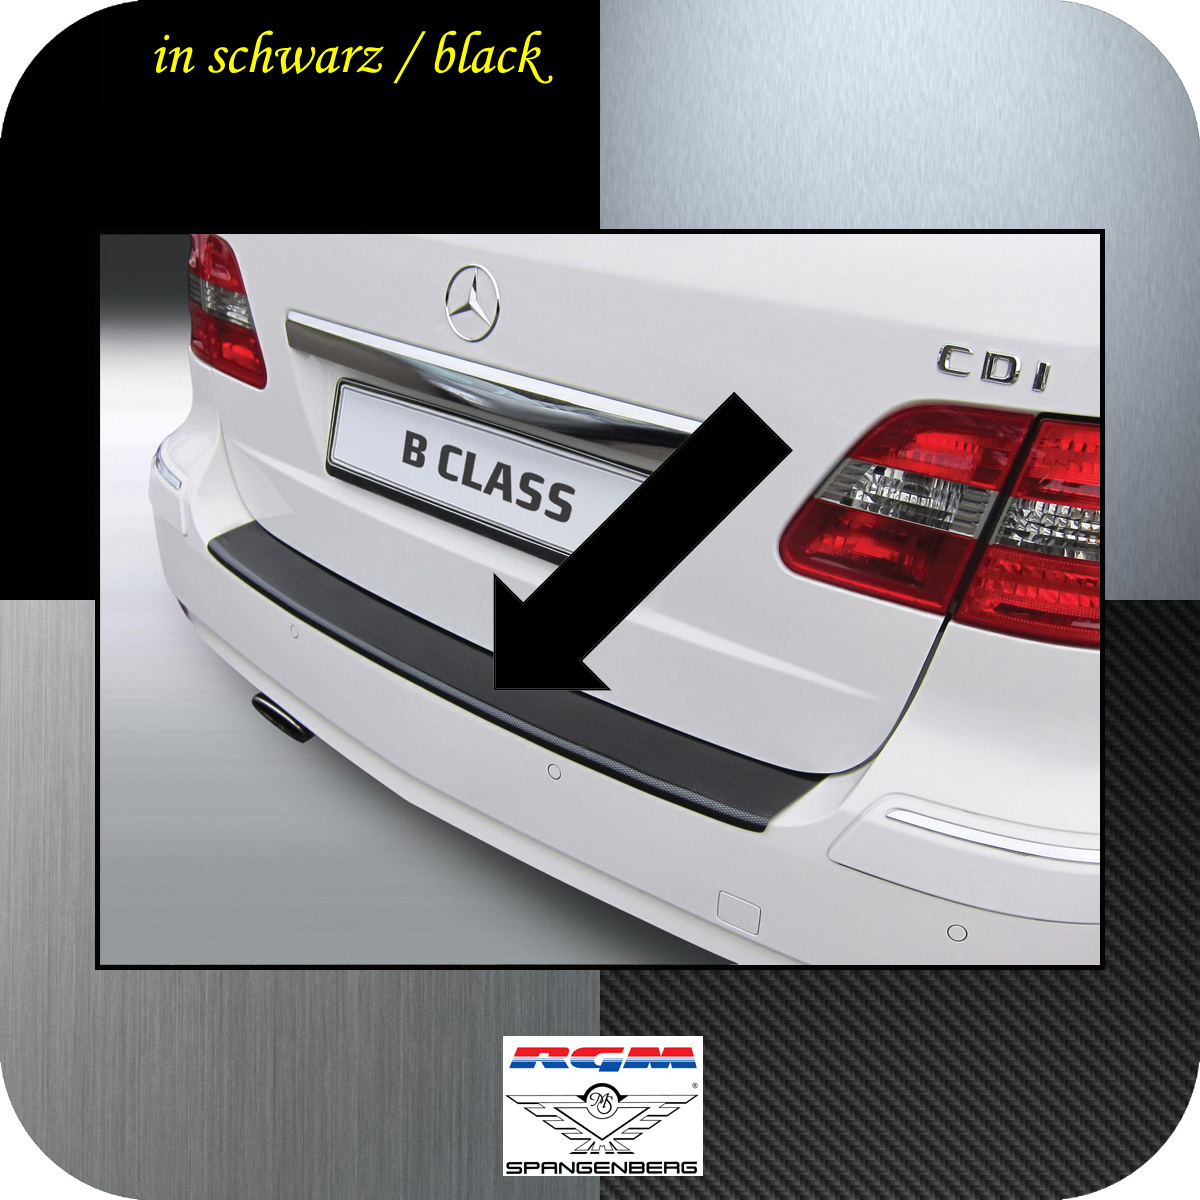 Eibach Pro-Kit Fahrwerksfedern Mercedes Benz B-Klasse W246 und W242 ab 11.2011